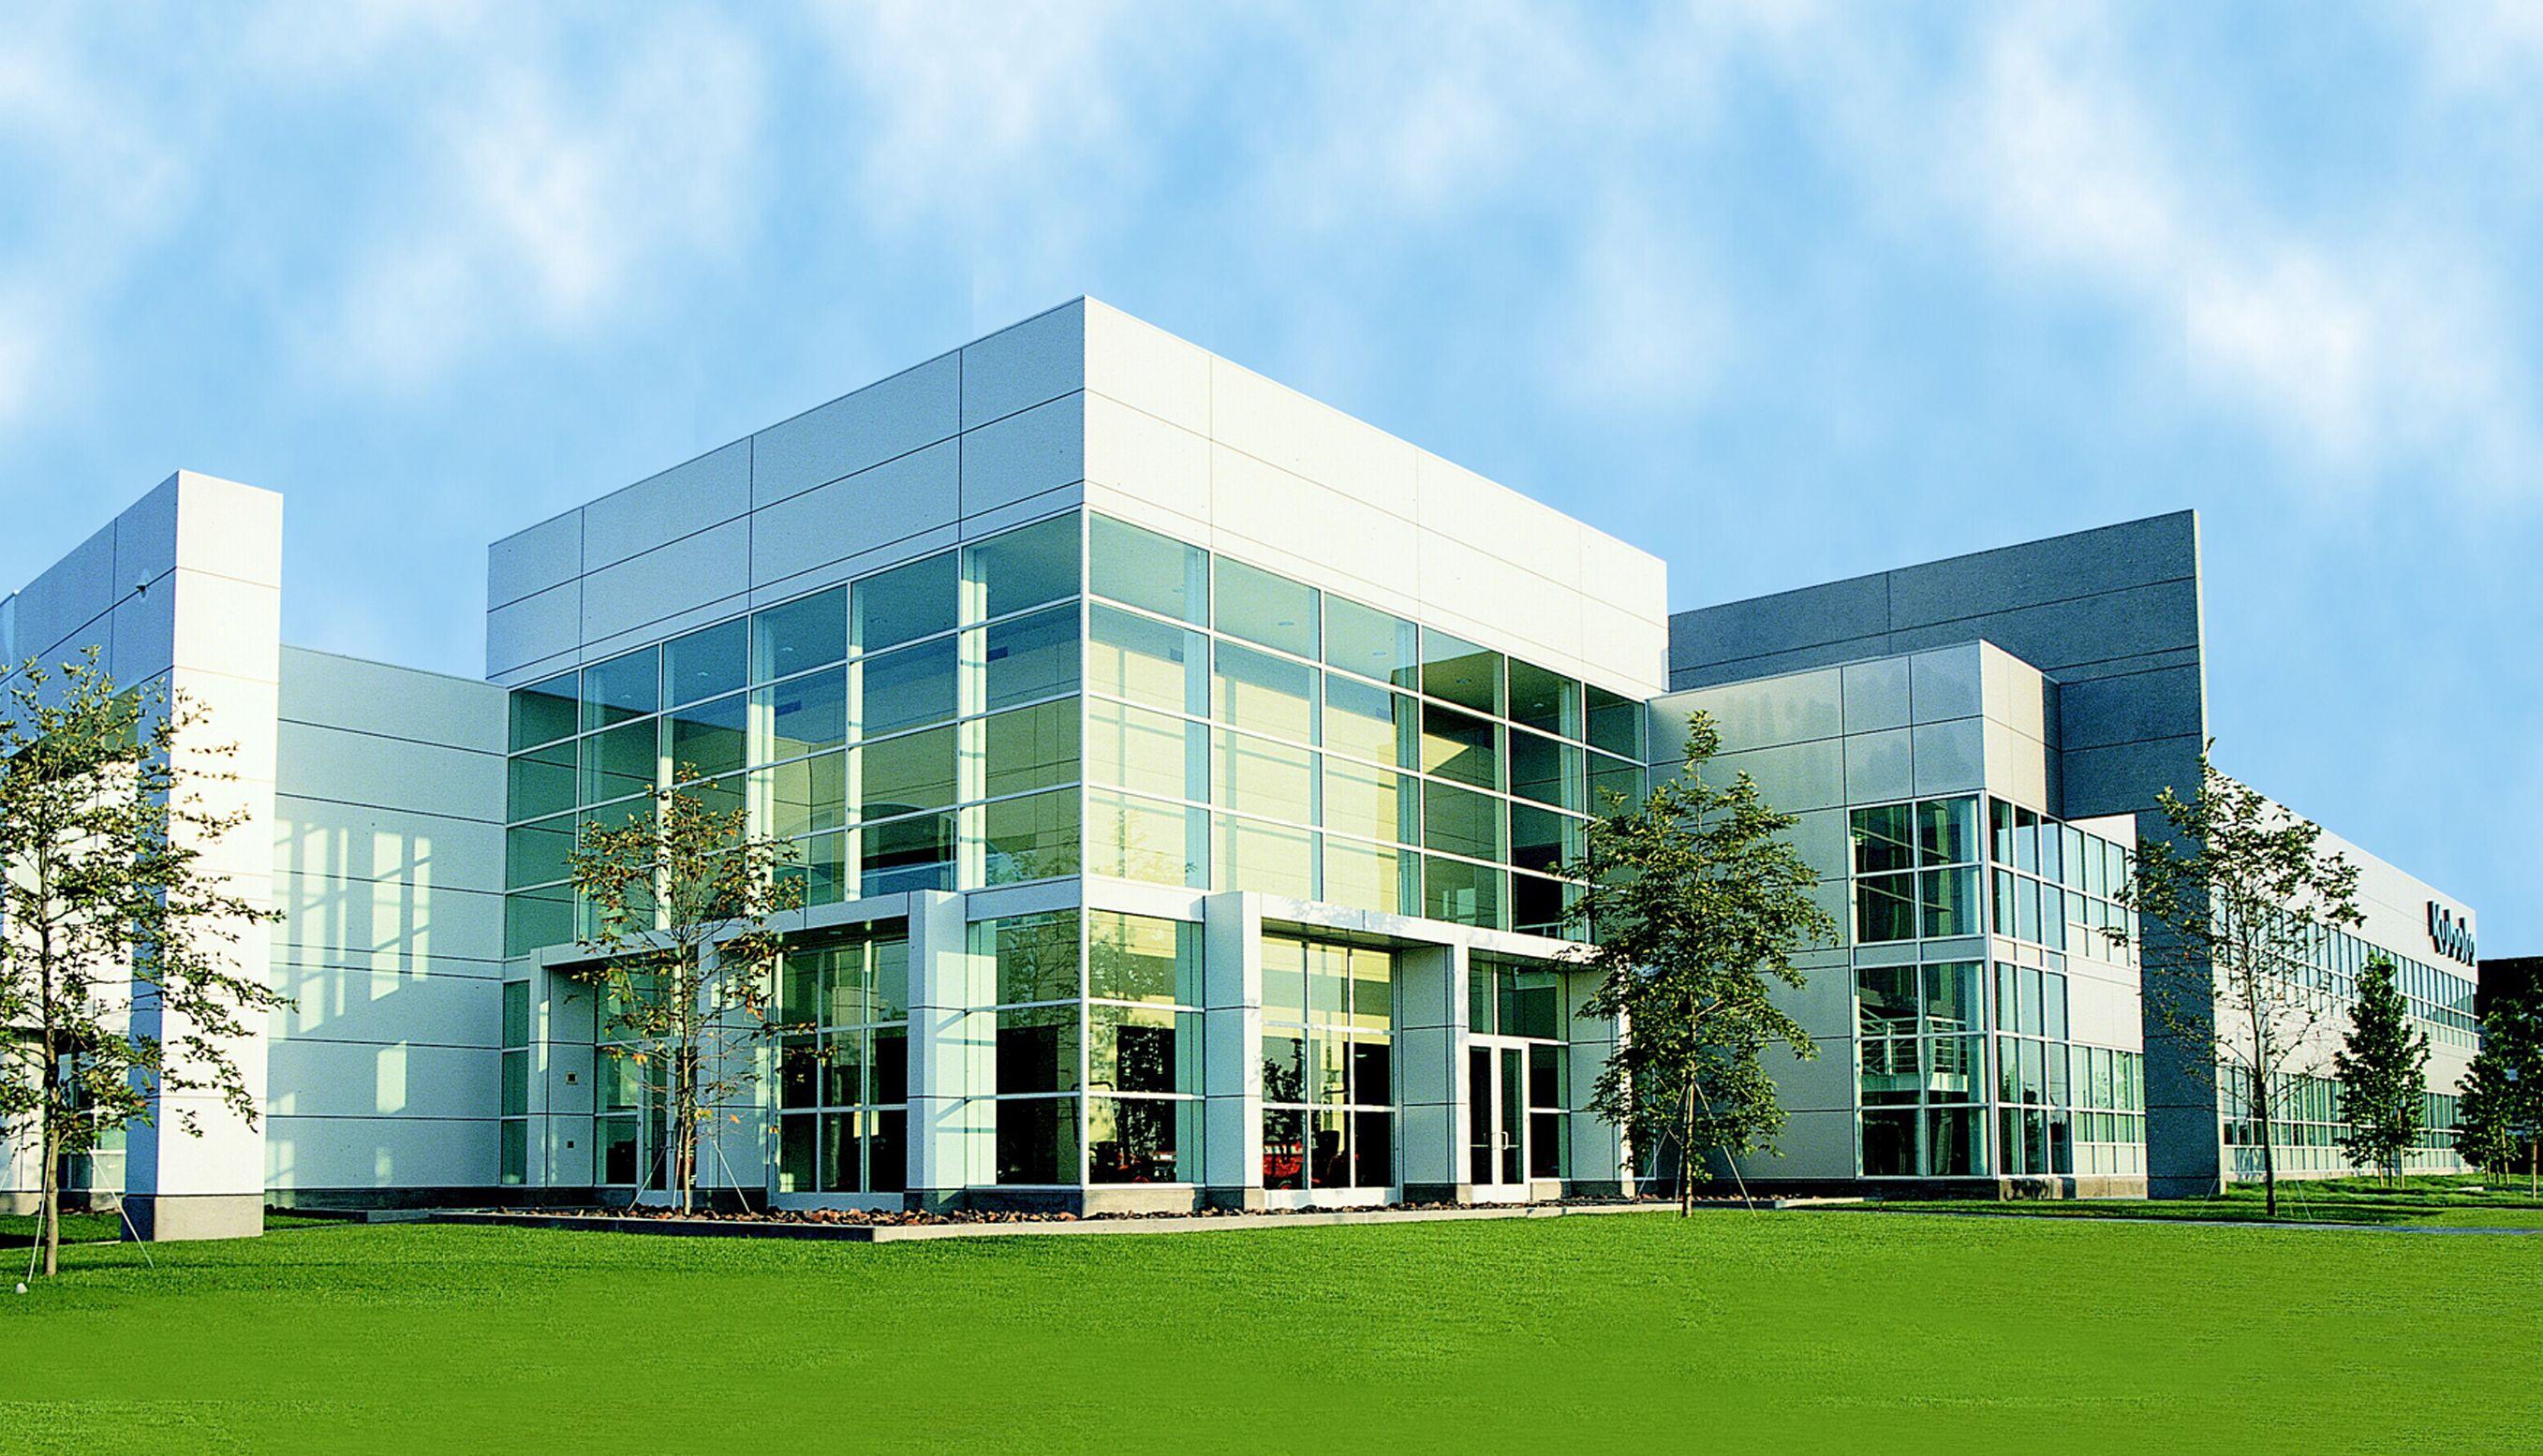 Kubota to Relocate Corporate Headquarters to Texas